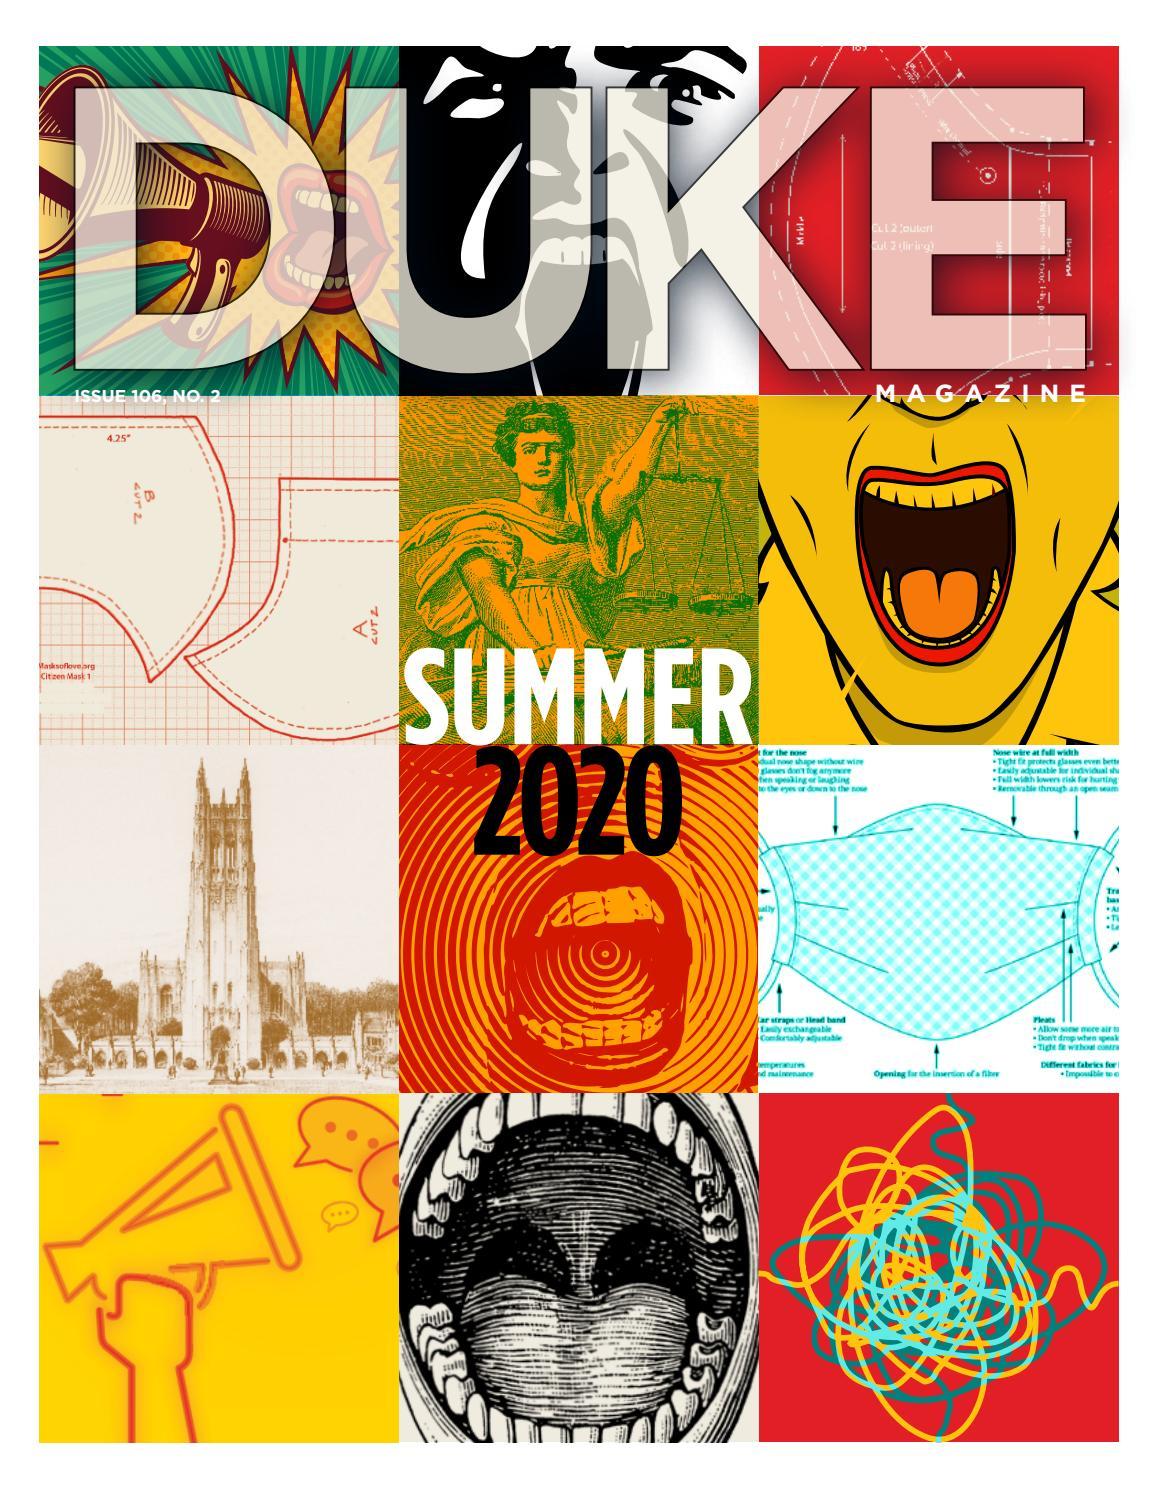 Summer 2020 By Dukemagazine Issuu